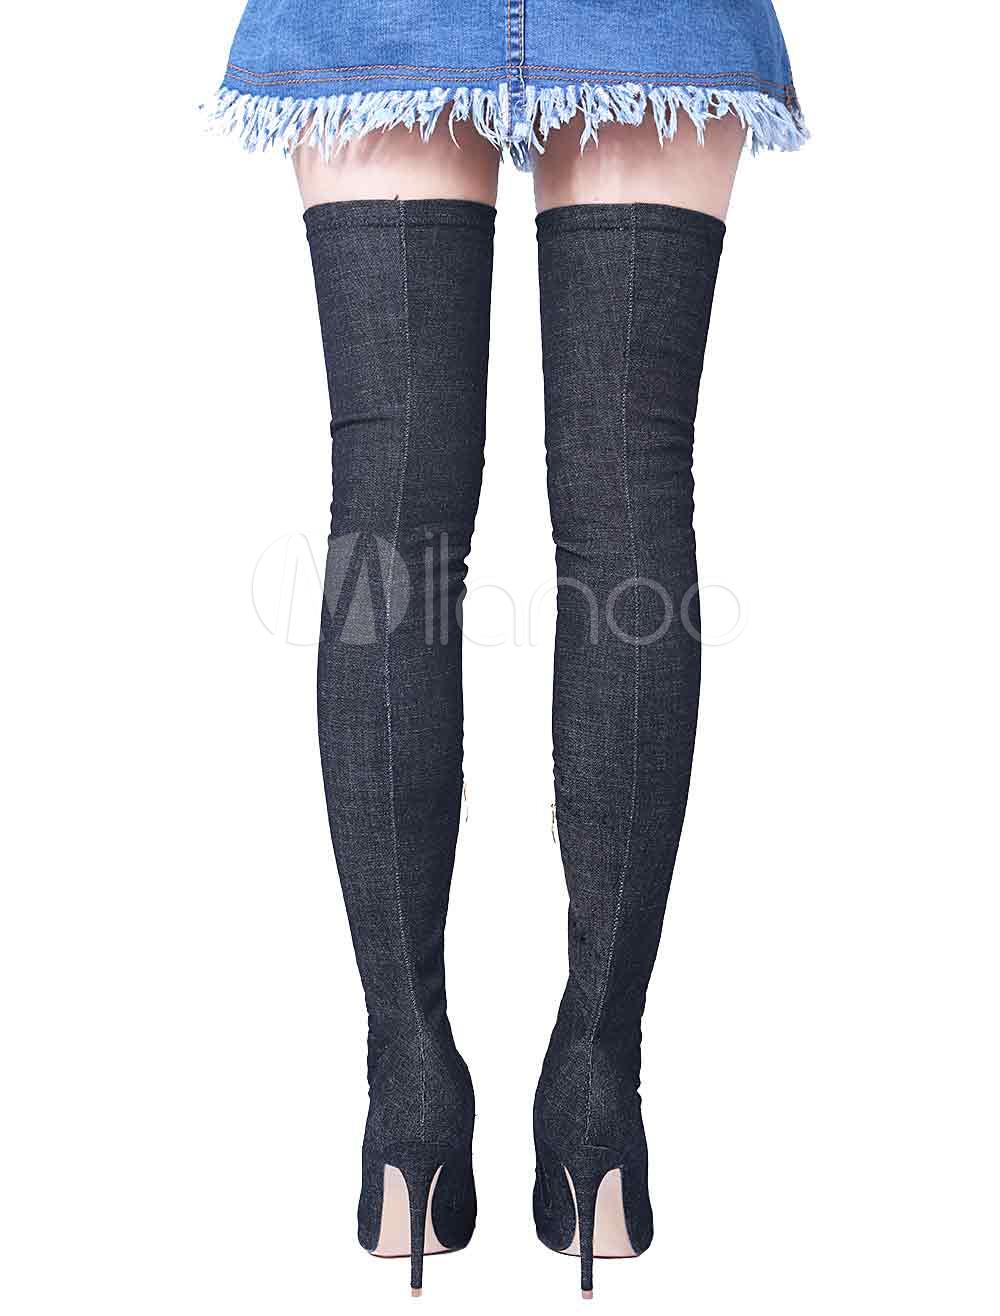 blue stretch bottes high heel femmes au dessus du genou bottes pointues de la cuisse. Black Bedroom Furniture Sets. Home Design Ideas